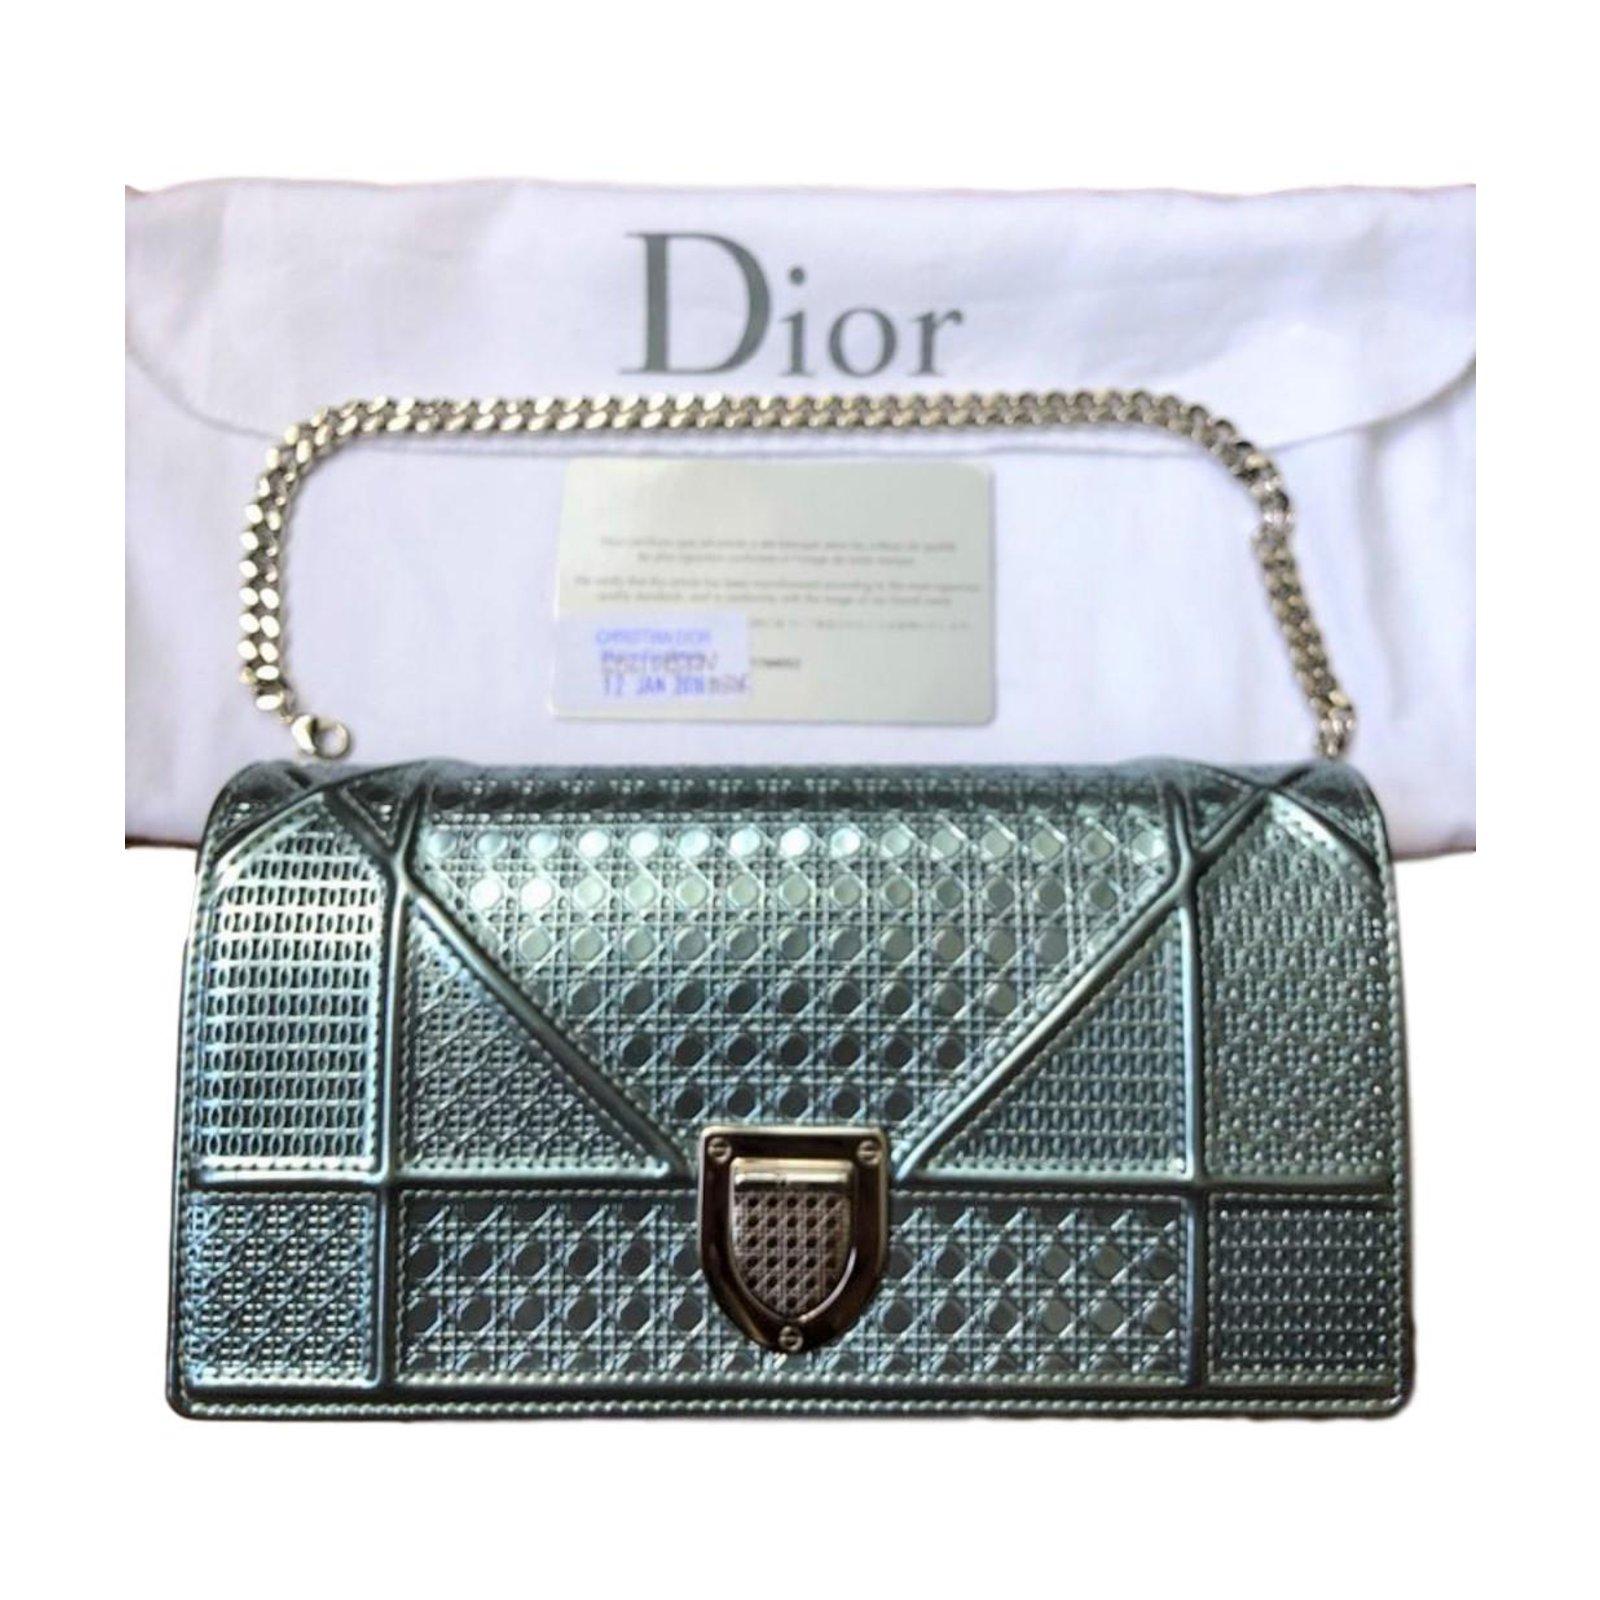 f0733dd3fa4d5 Dior Diorama Metallic Leather clutch wallet on chain bag Clutch bags  Leather Green ref.73610